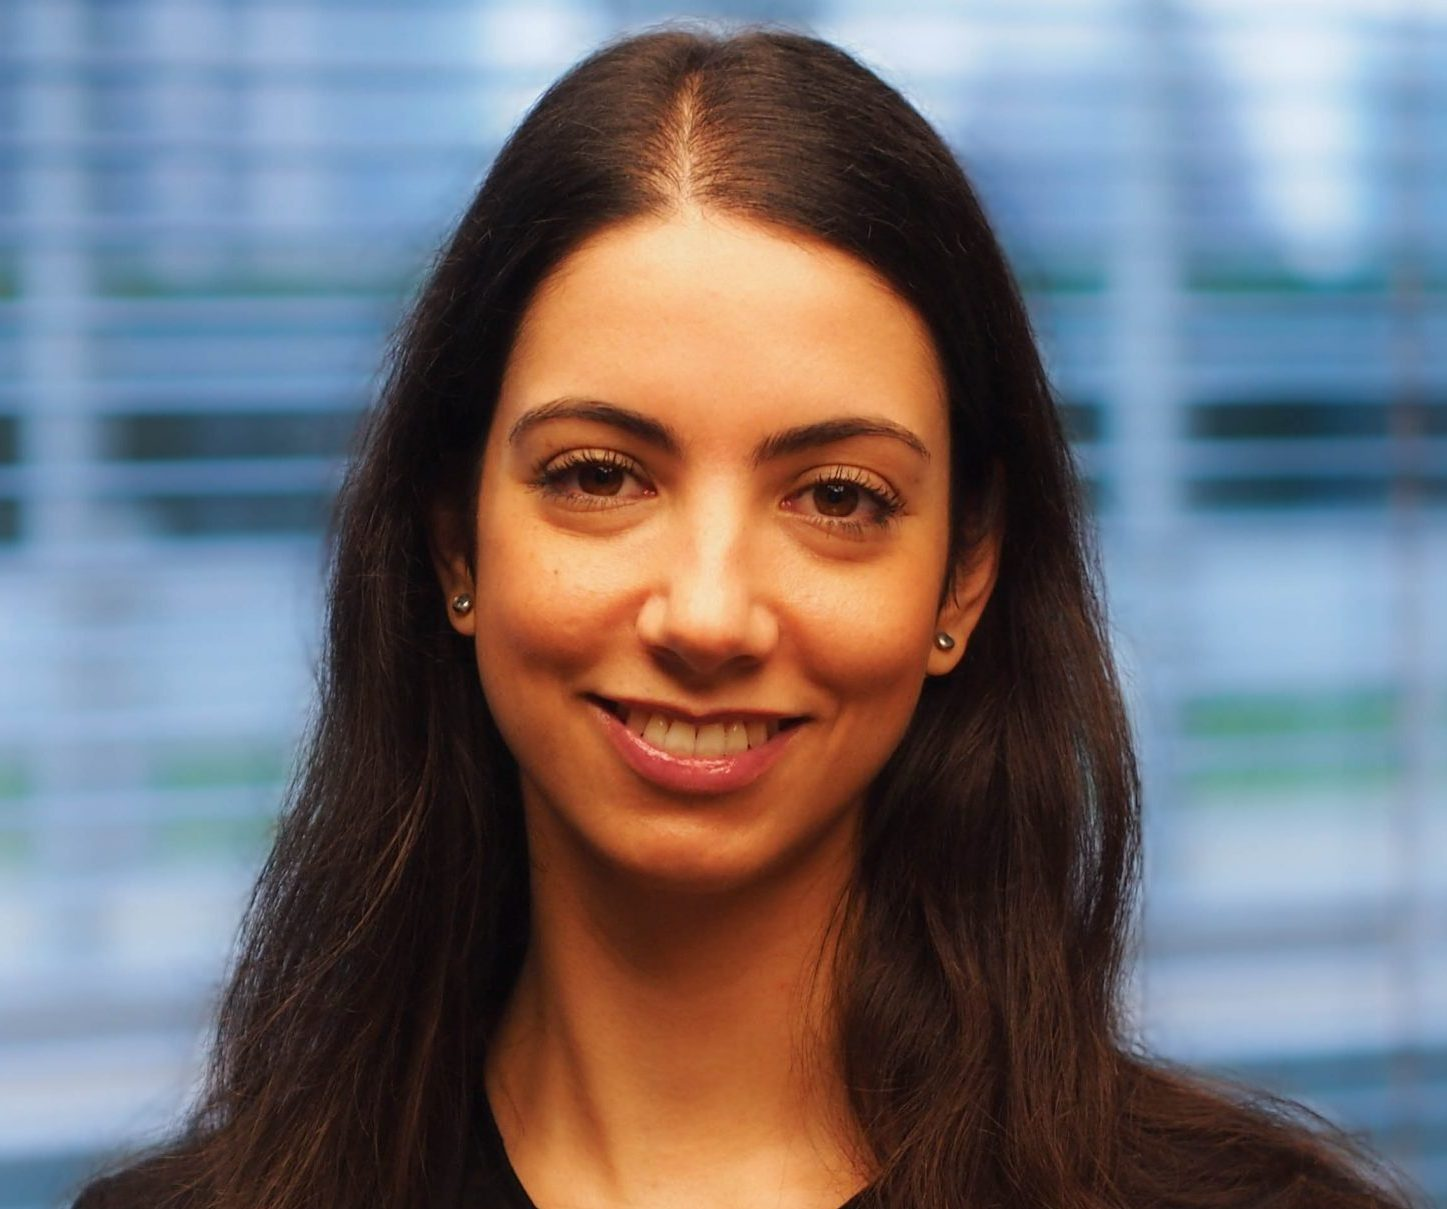 20200519 LQG Evening Seminar – Katharina Schwaiger – BlackRock 18:30 – On-Line – ESG in Factors